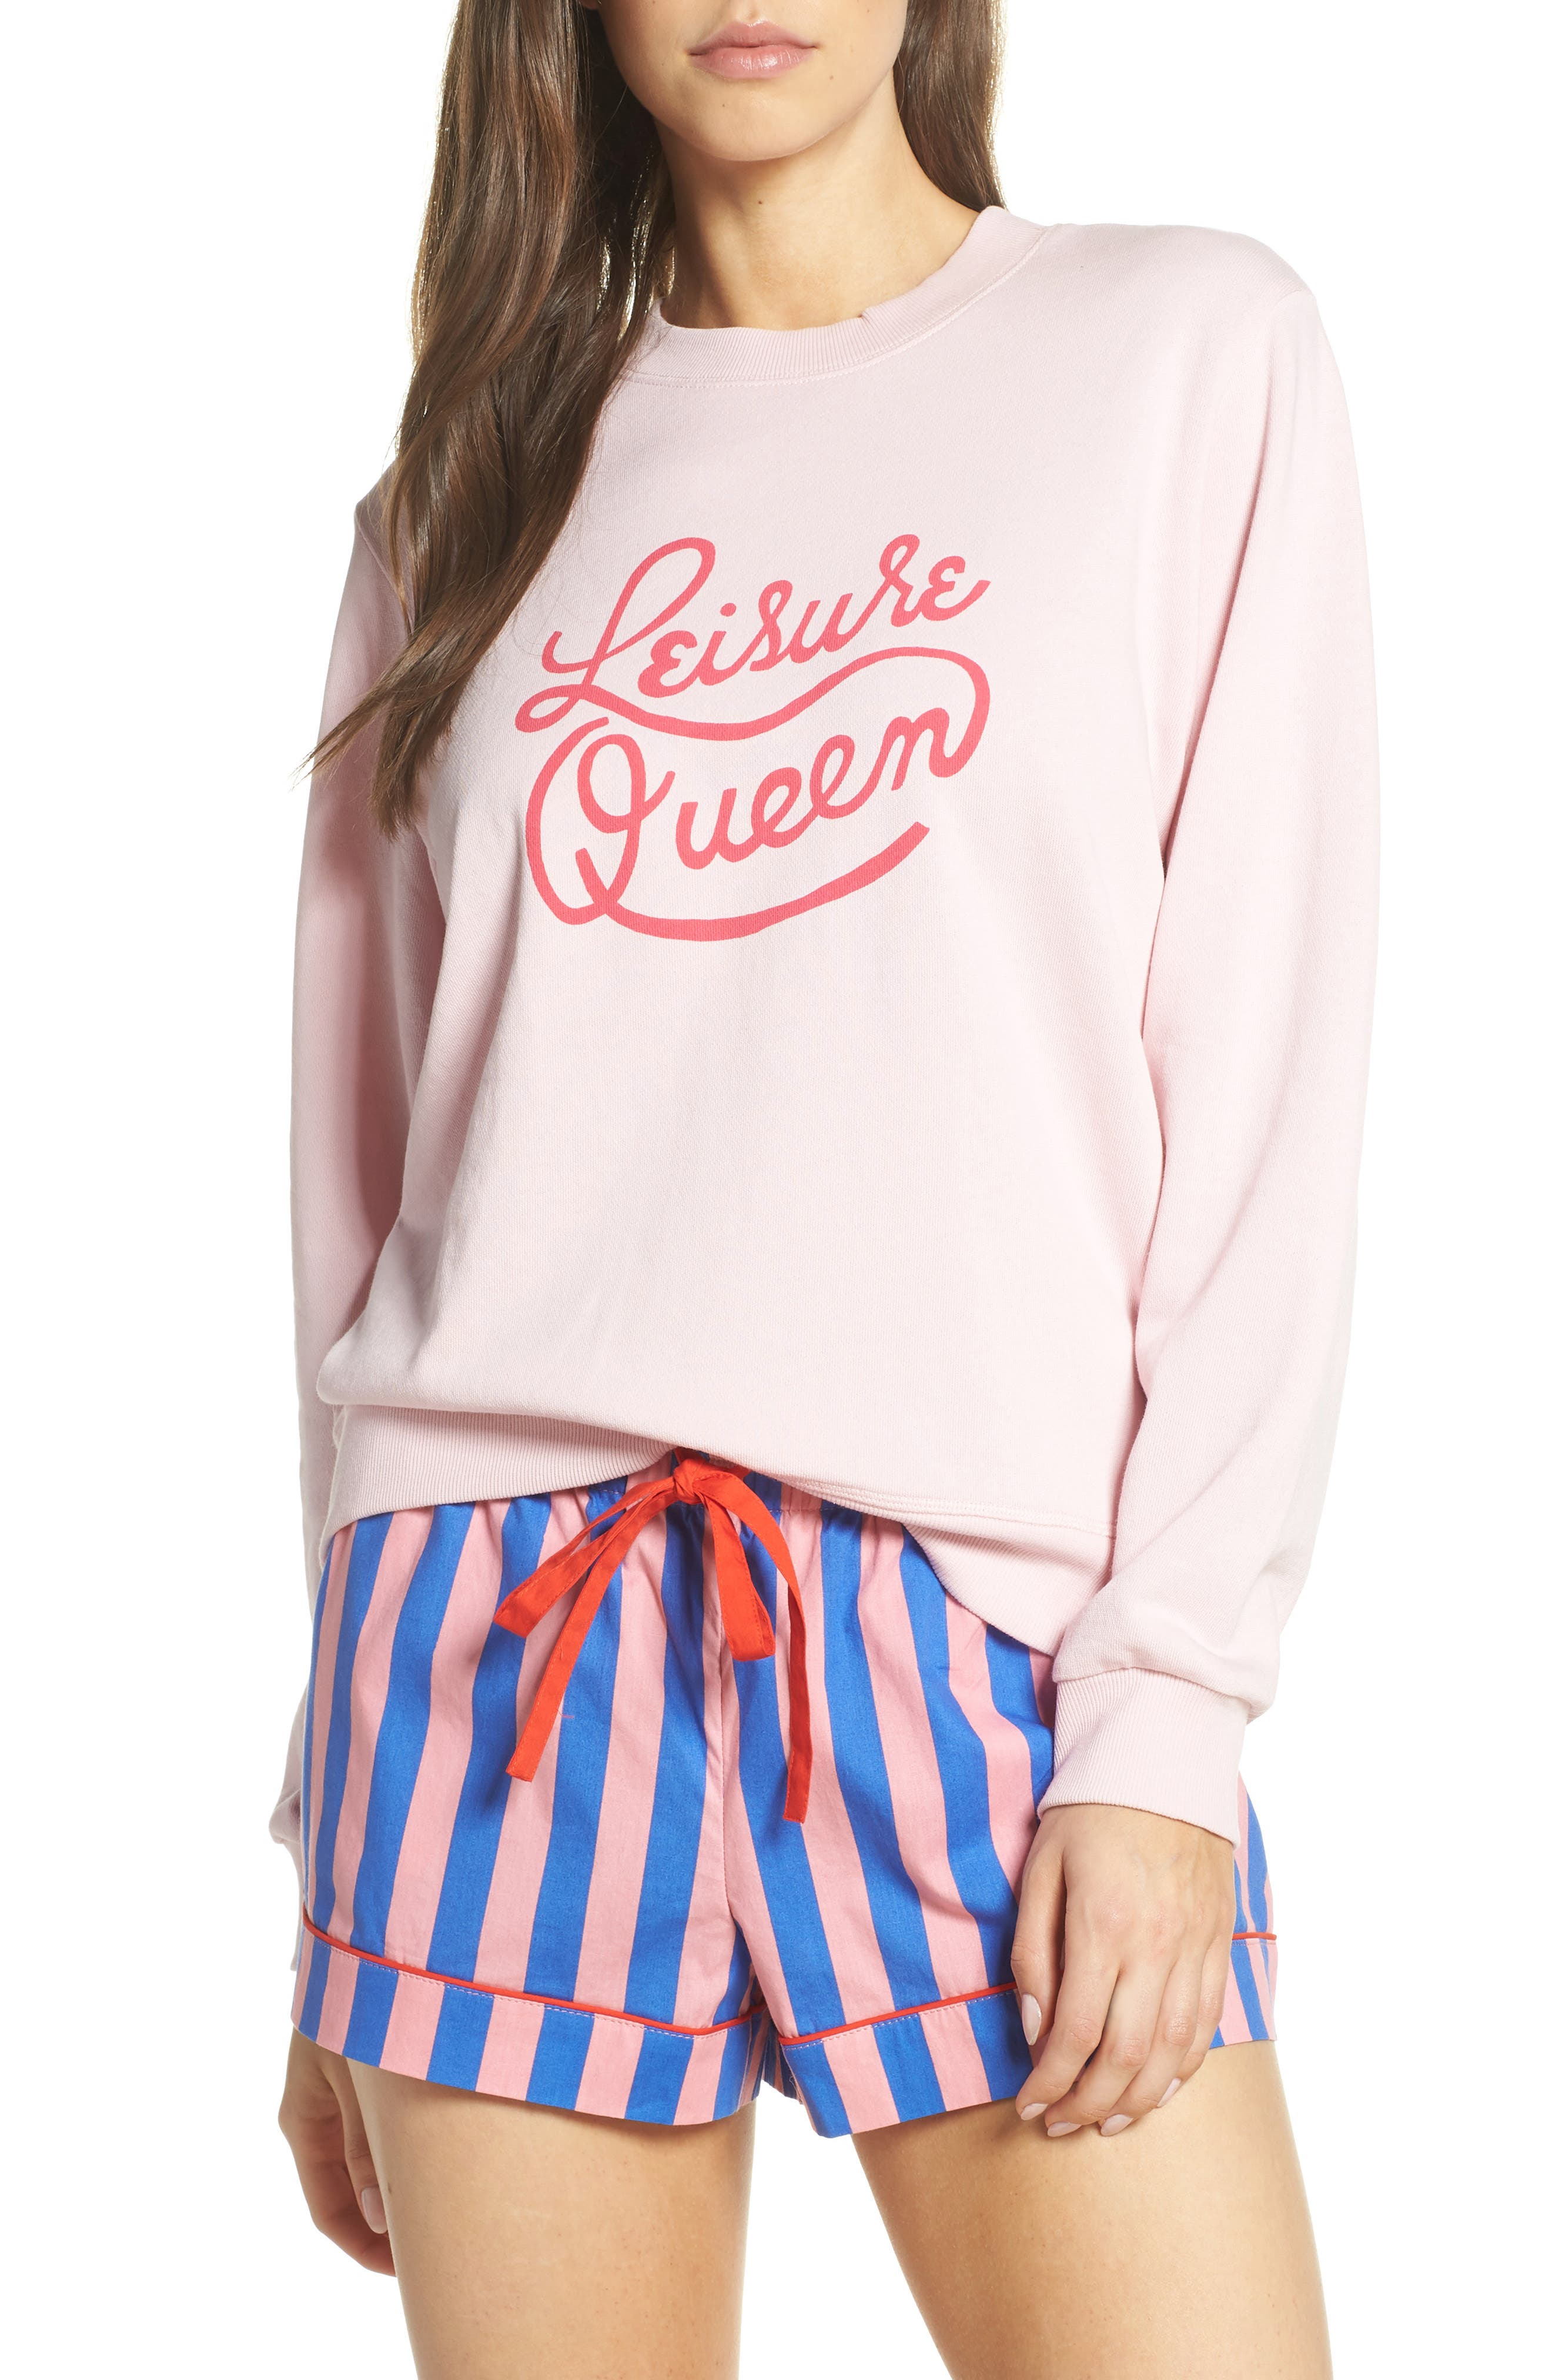 BAN.DO, Leisure Queen Sweatshirt, Main thumbnail 1, color, PINK